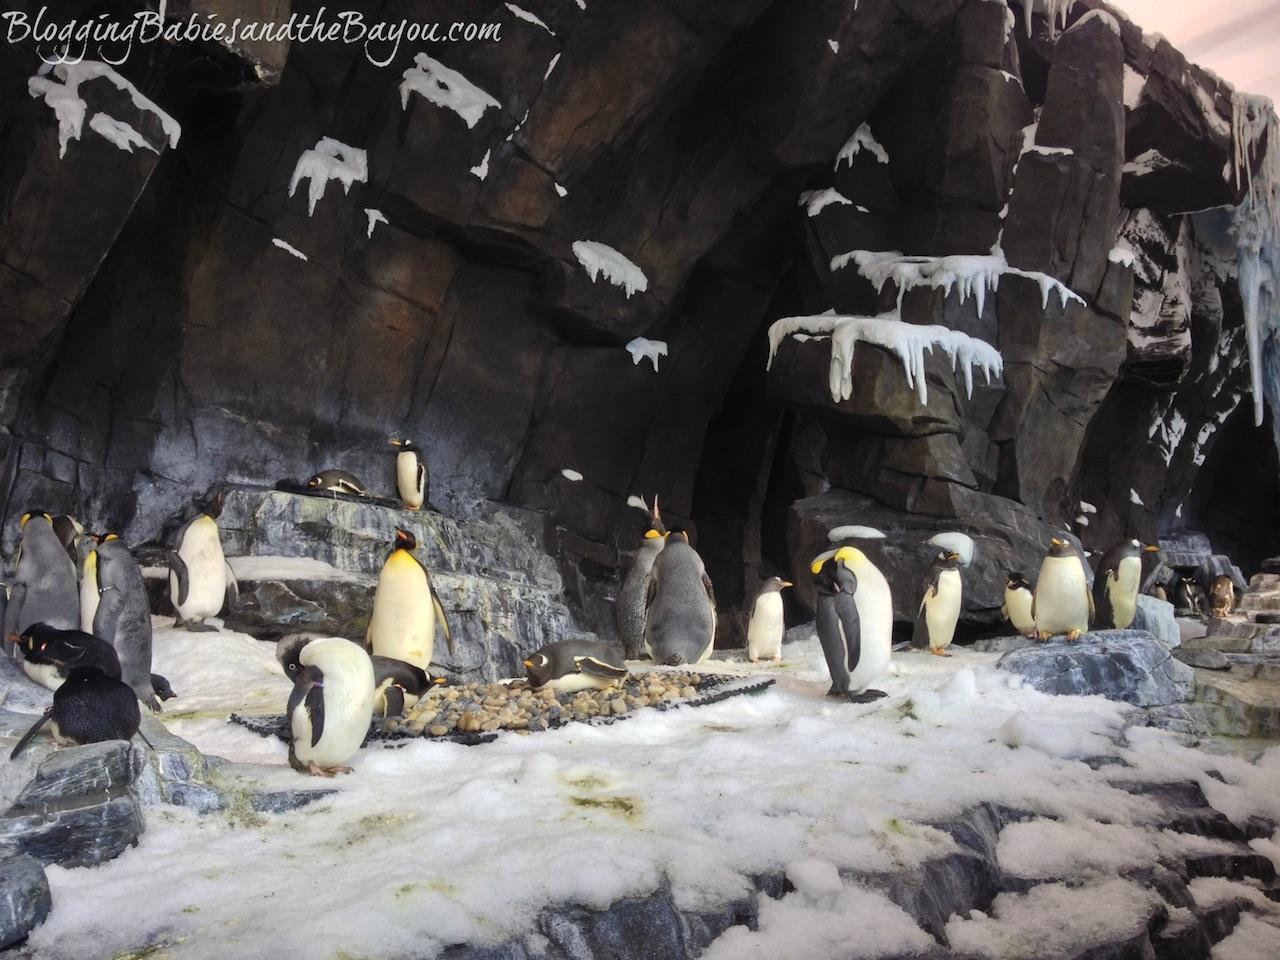 Empire of the Penguins Exhibt at Sea World Orlando Florida #BayouTravel